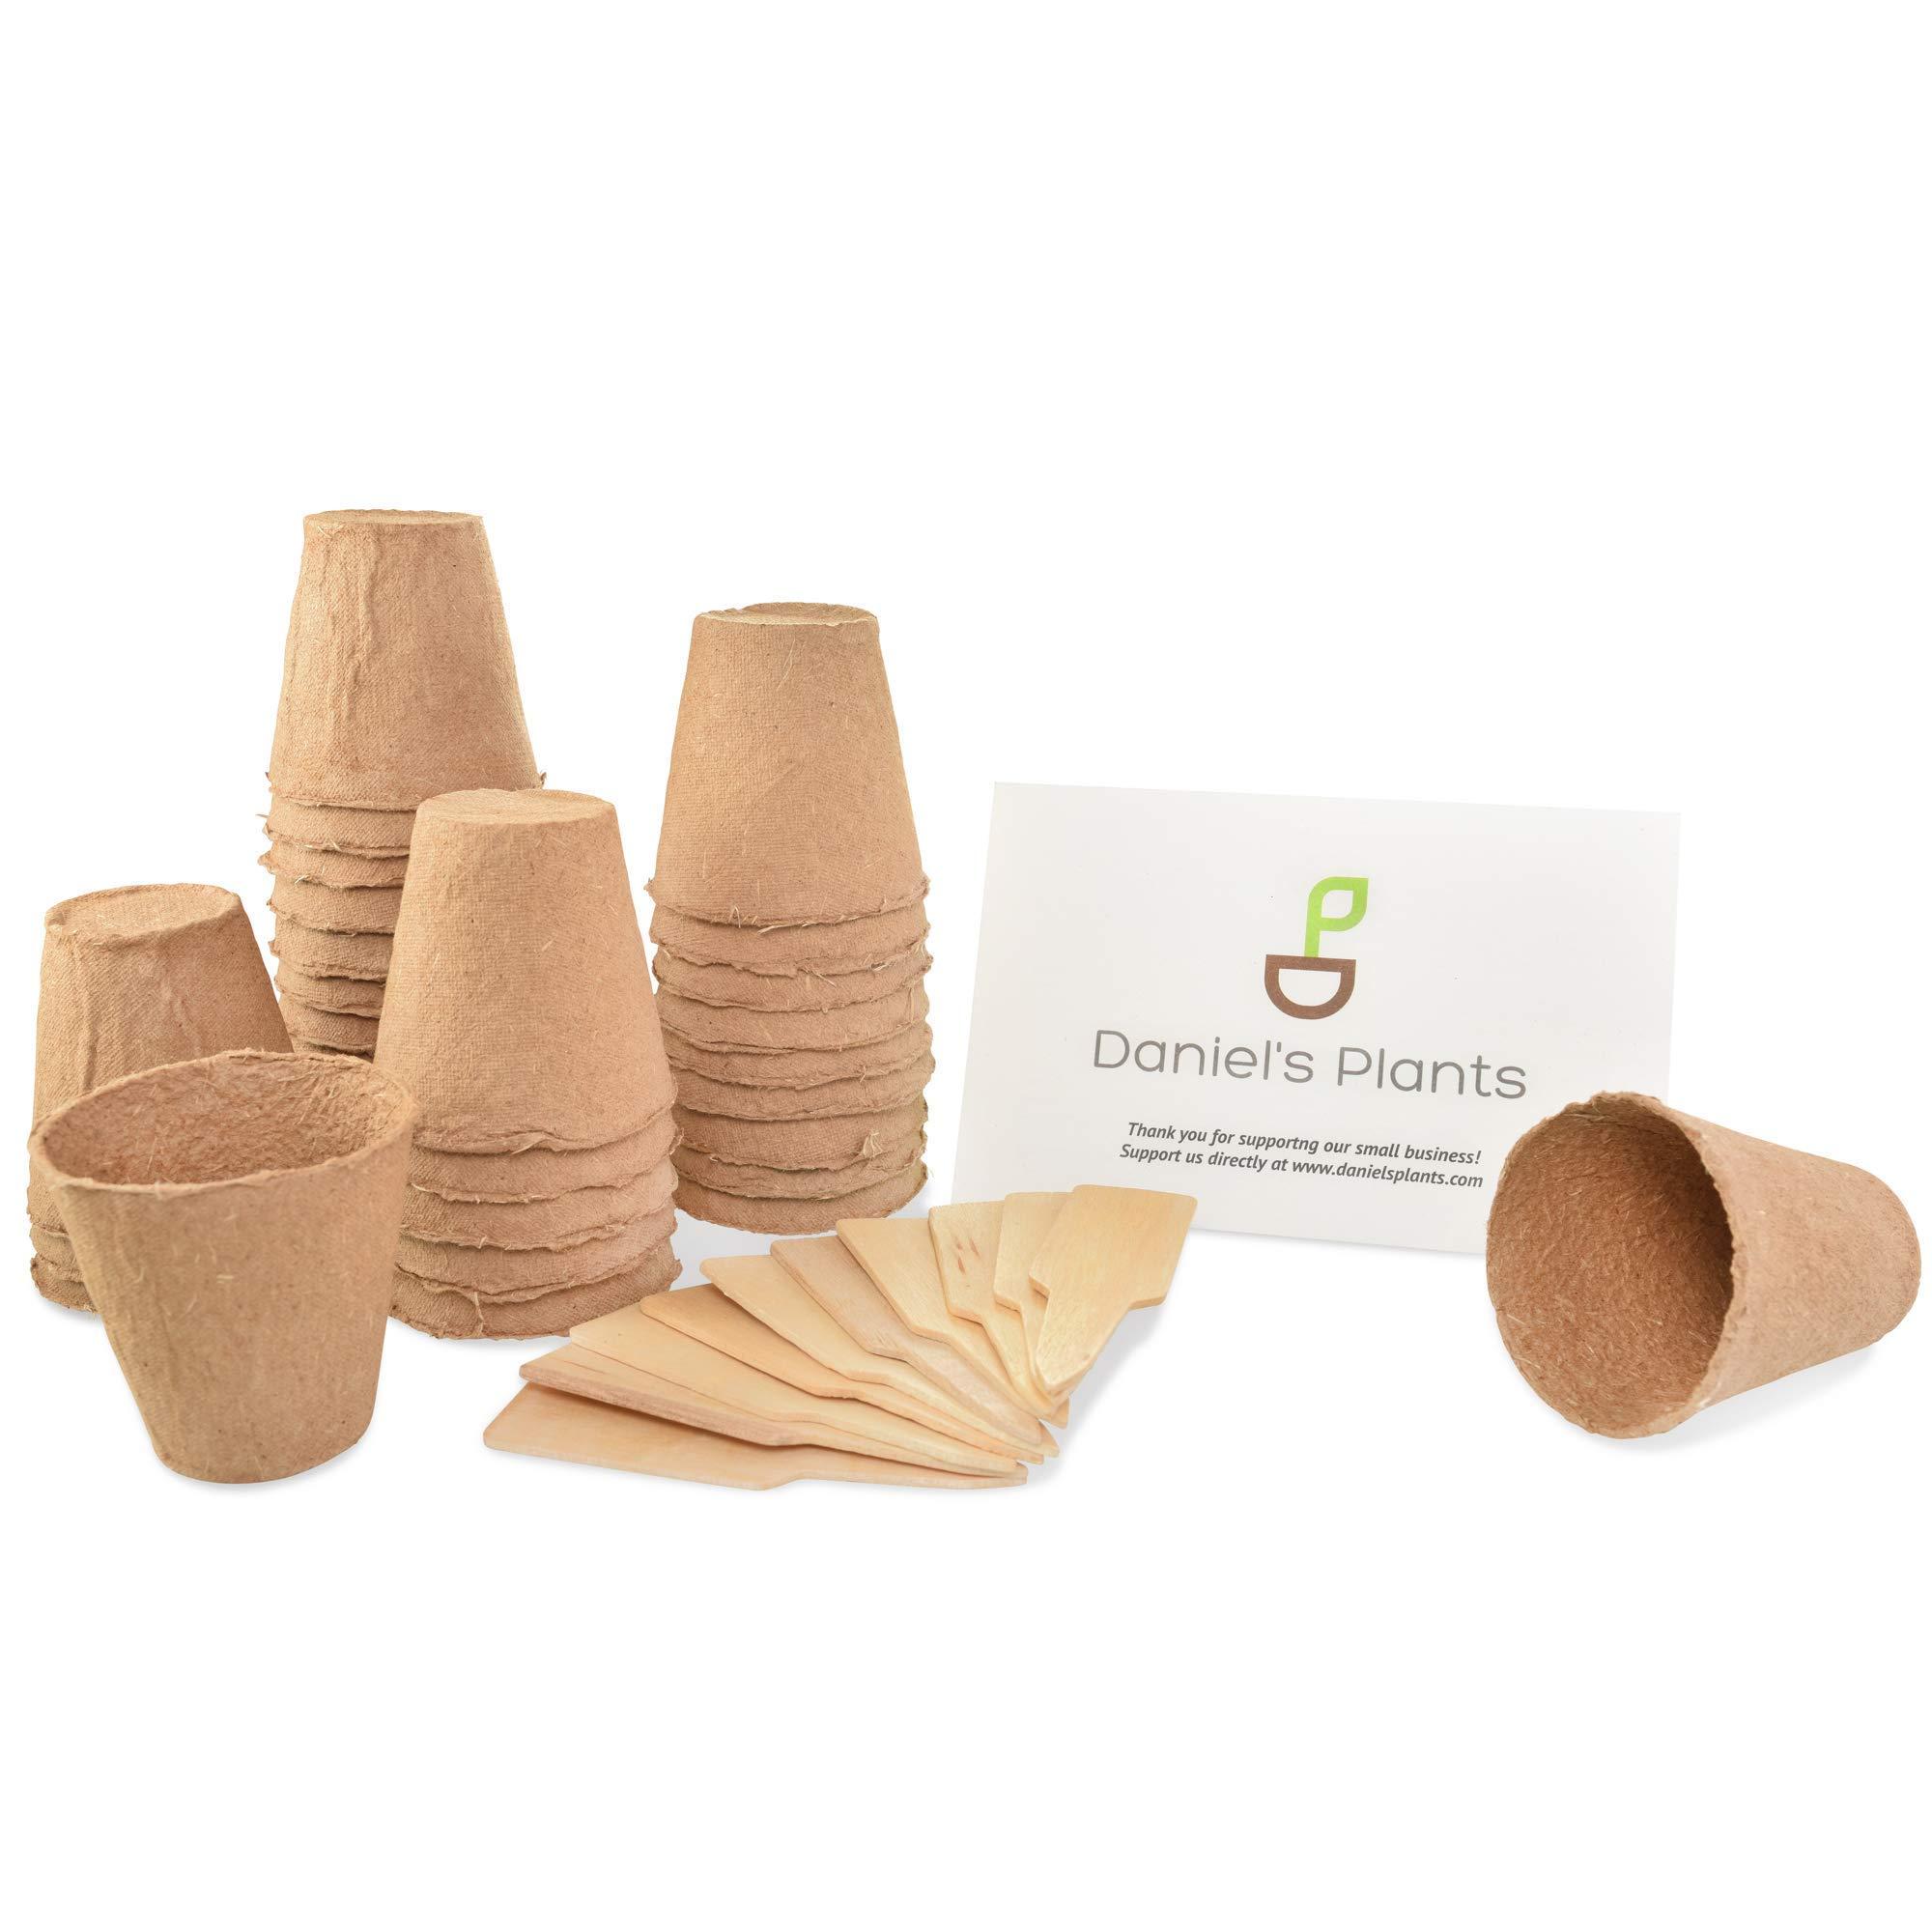 "Daniel's Plants 3"" Peat Pots | Plant Pots for Seedlings & Seed Starter Nursery Pots | Organic Biodegradable Plantable Pots | Eco Friendly | Bonus 10 Wooden Plant Garden Labels | Bulk 60 Pack | 3 Inch"